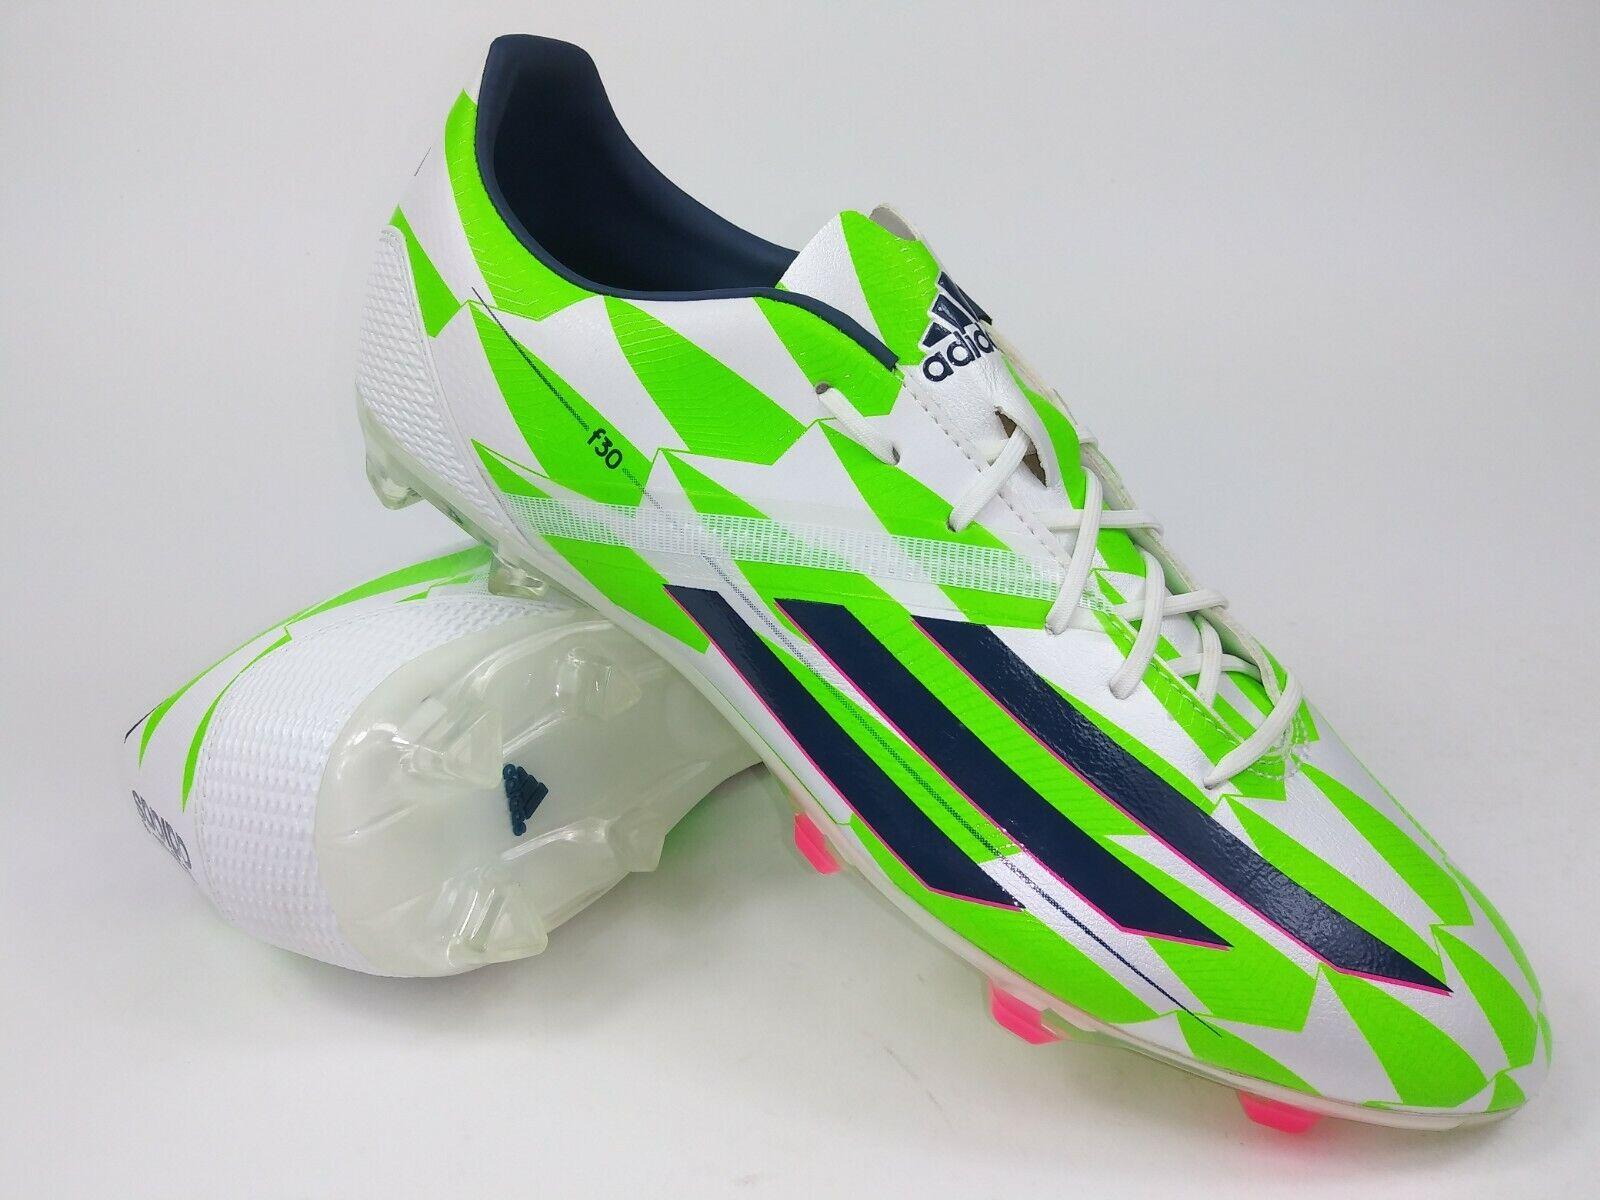 e1eb66871 Adidas Mens Rare F30 FG M17625 Green White Soccer Cleats Football Boots  Size 10